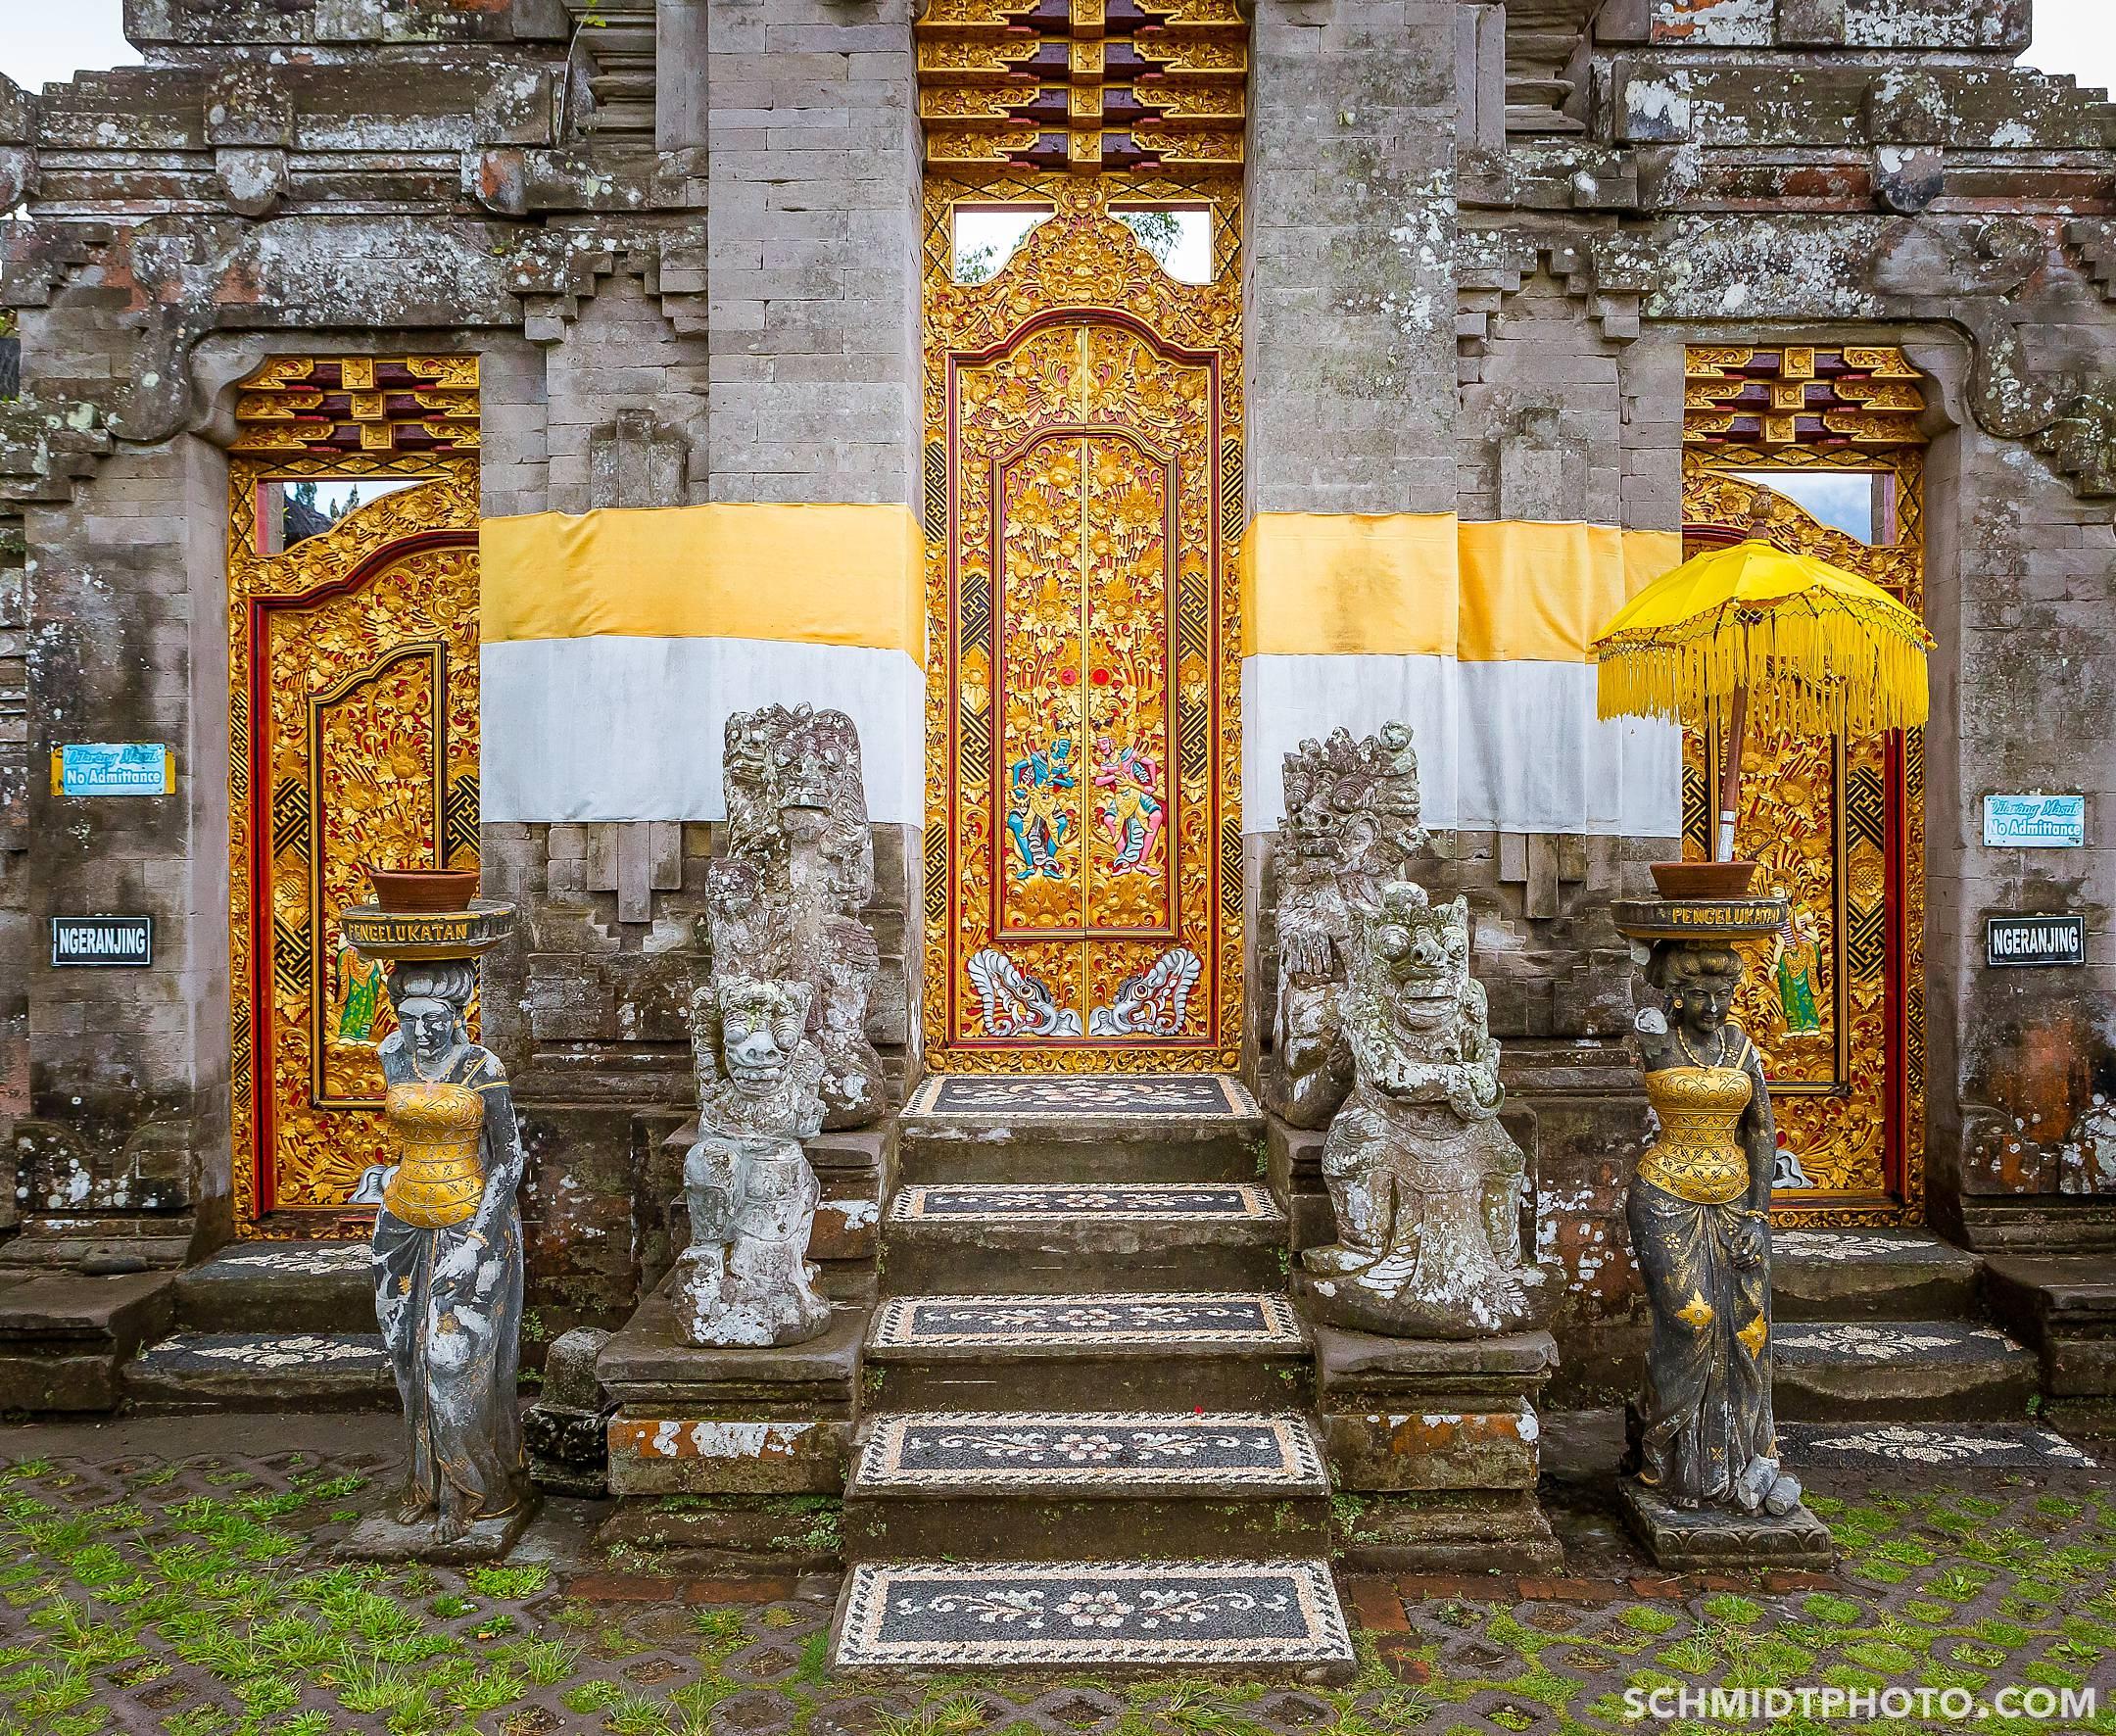 bali-indonesia-schmidt-photo-travel-with-tom-priscilla_2801